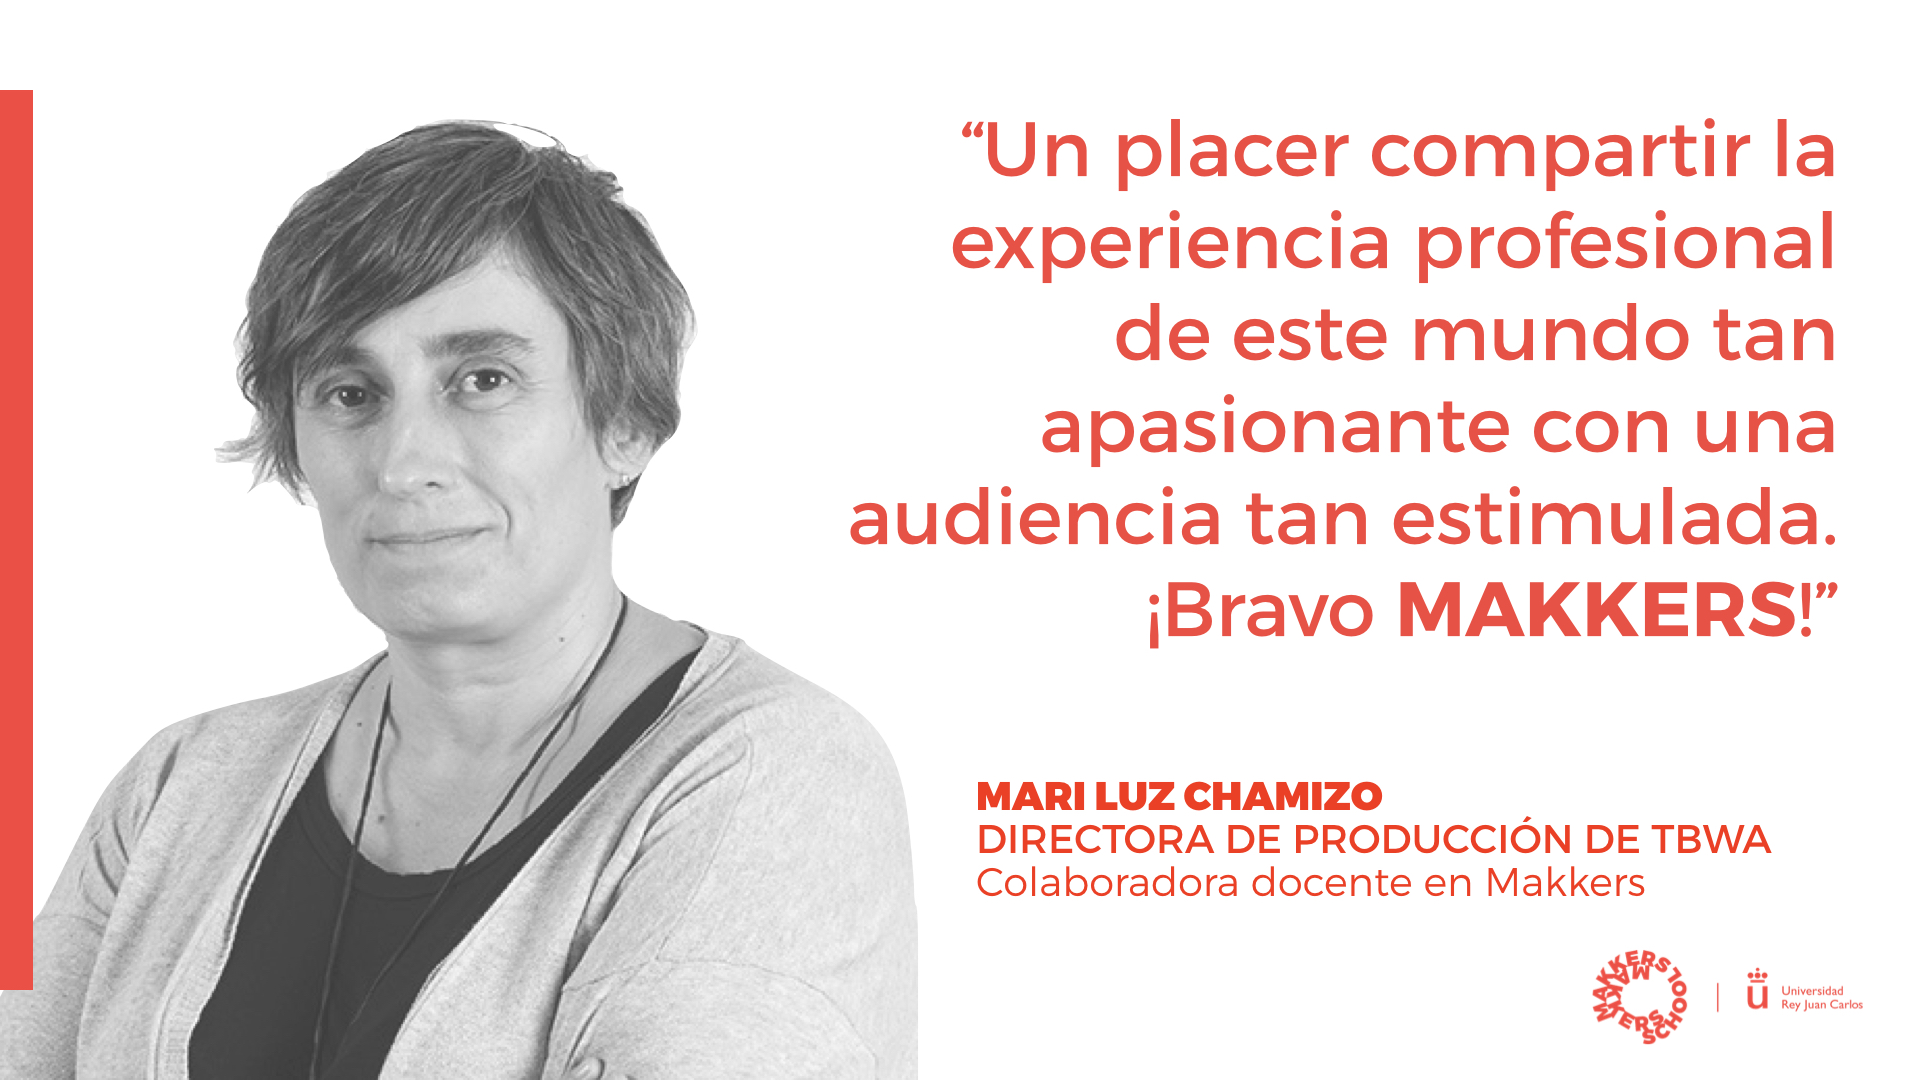 9-Frase de Mari Luz Chamizo.001.jpeg